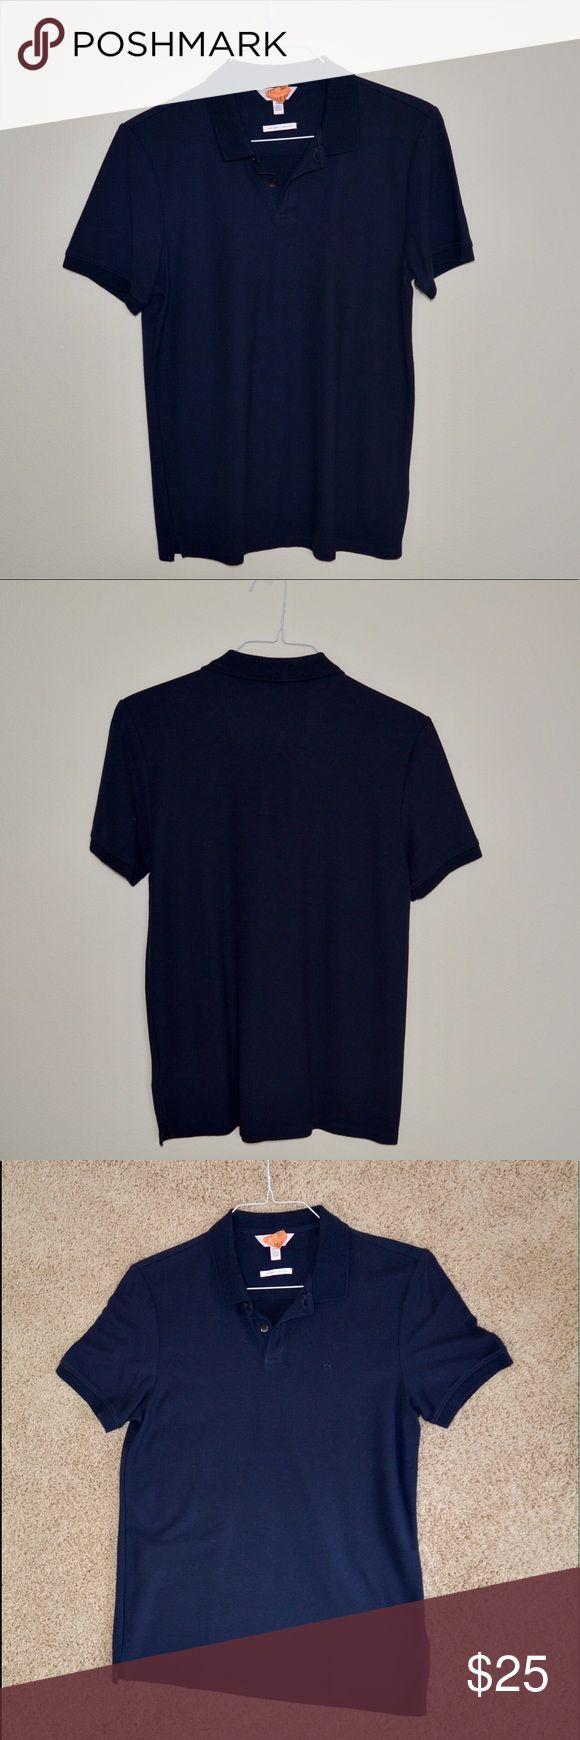 Selling this ❗️SALE❗️Calvin Klein Polo Shirt on Poshmark! My username is: priceynik. #shopmycloset #poshmark #fashion #shopping #style #forsale #Calvin Klein #Other